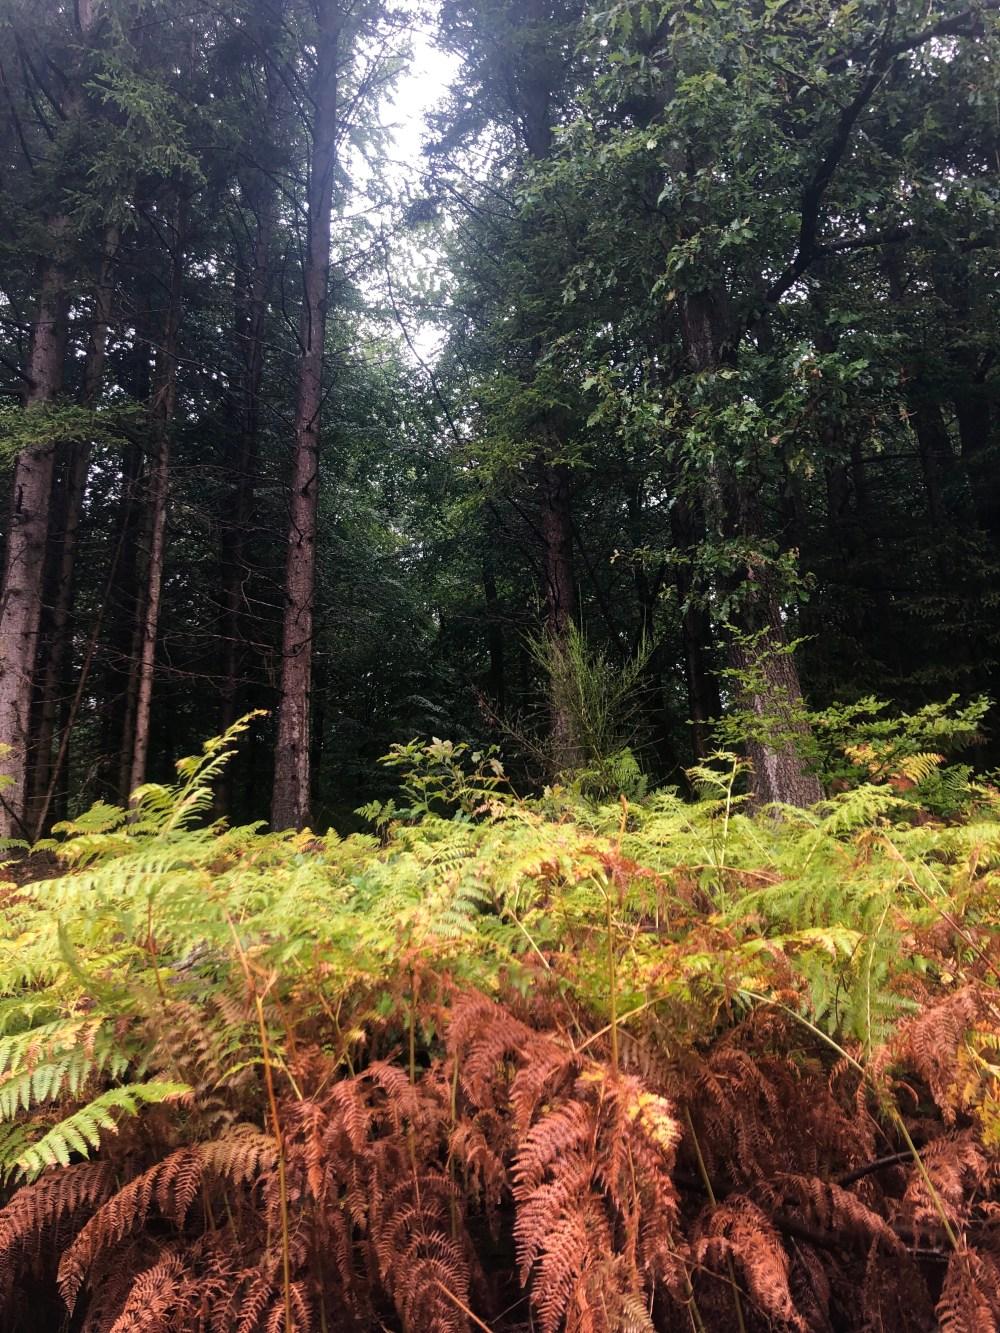 Fahn Pflanzen vor Bäumen